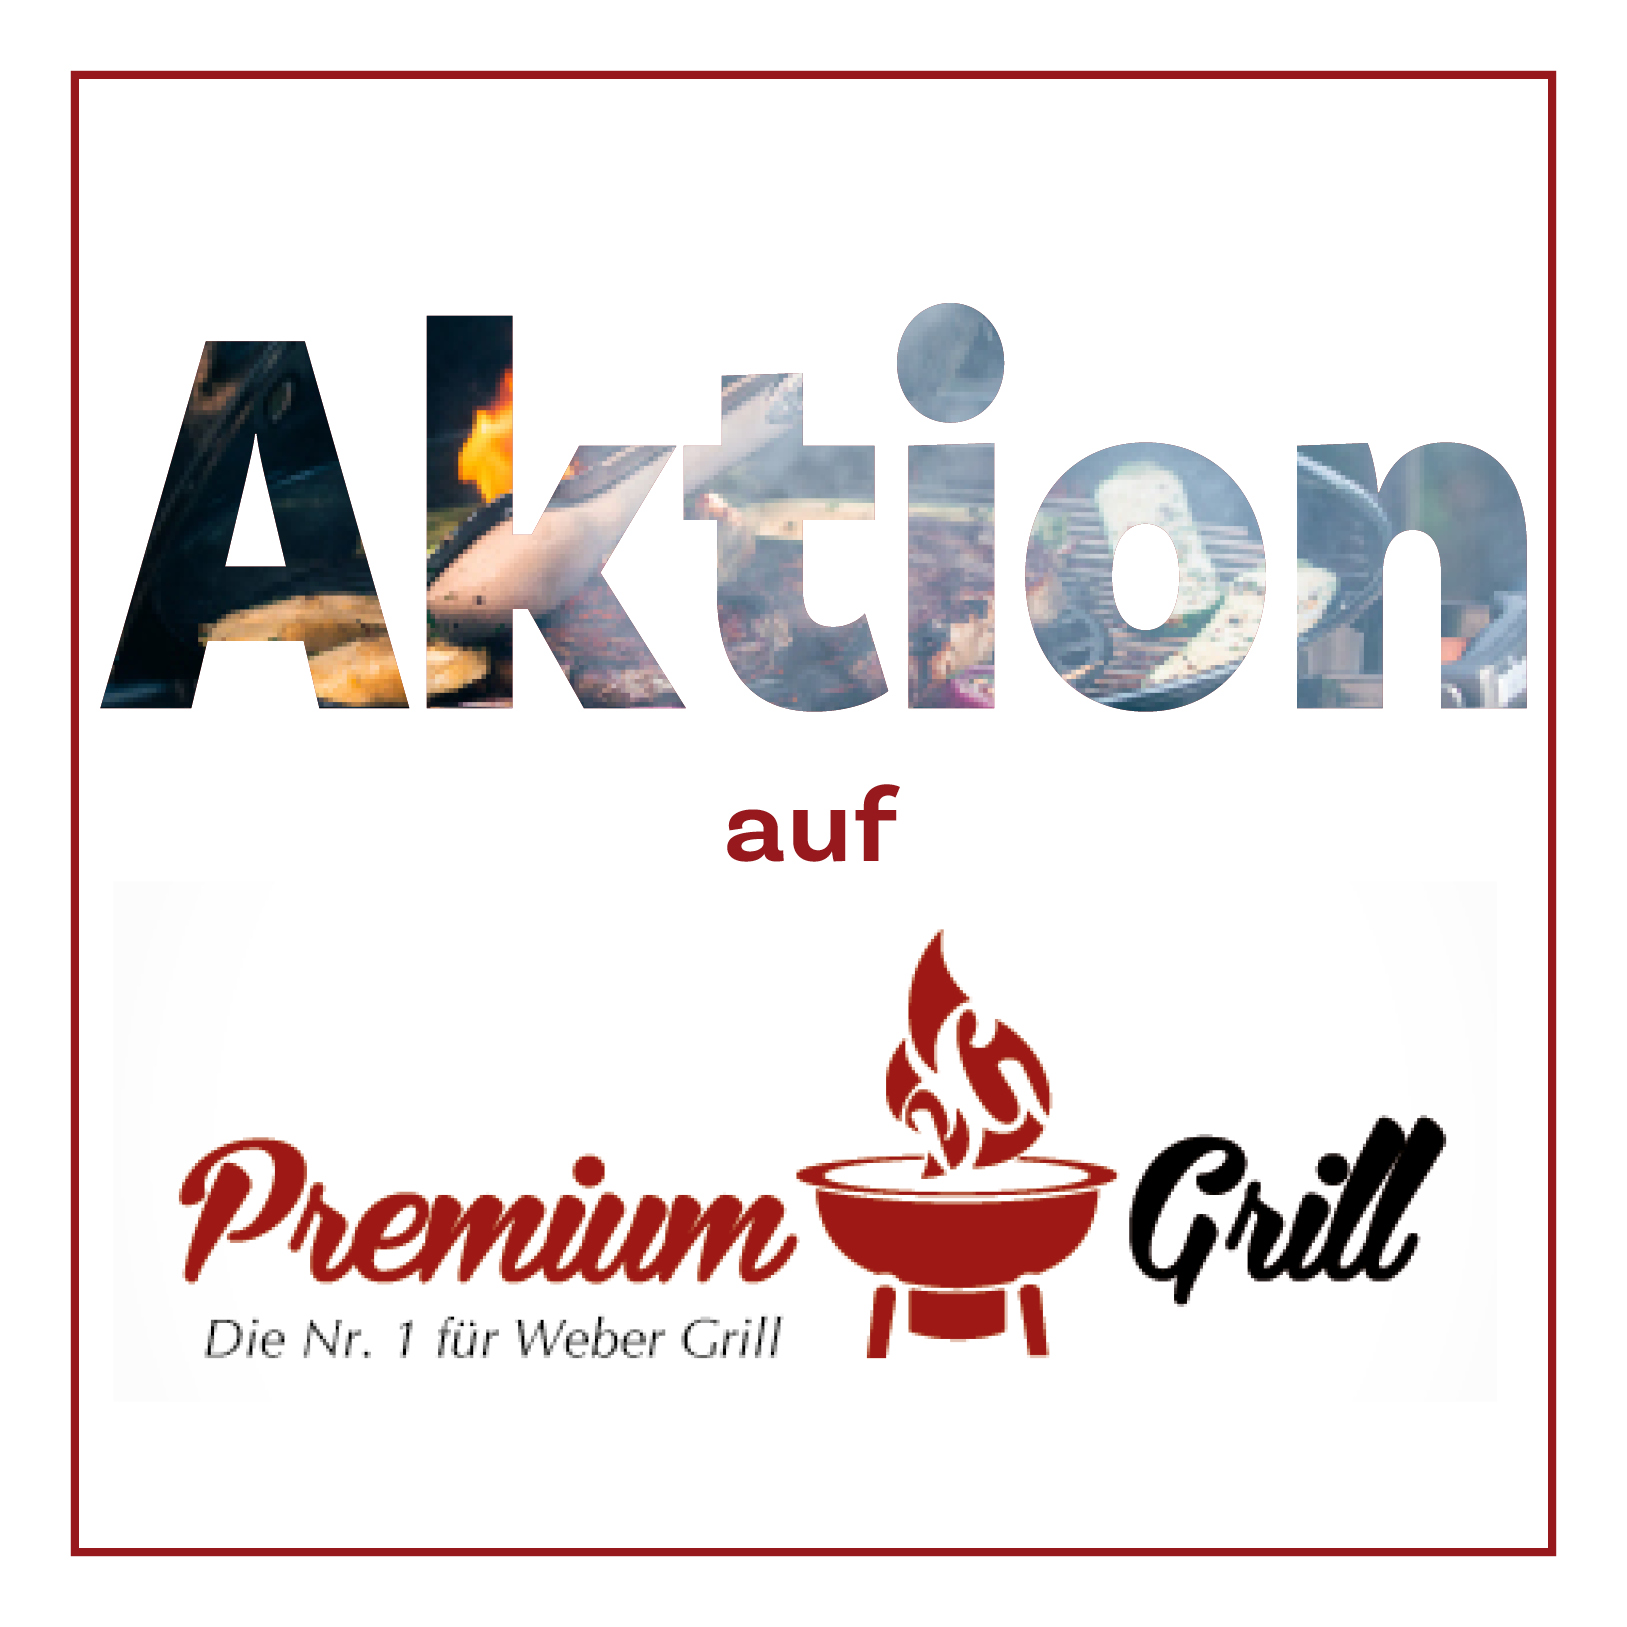 https://www.premium-grill.ch/categorie/aktionen-2941